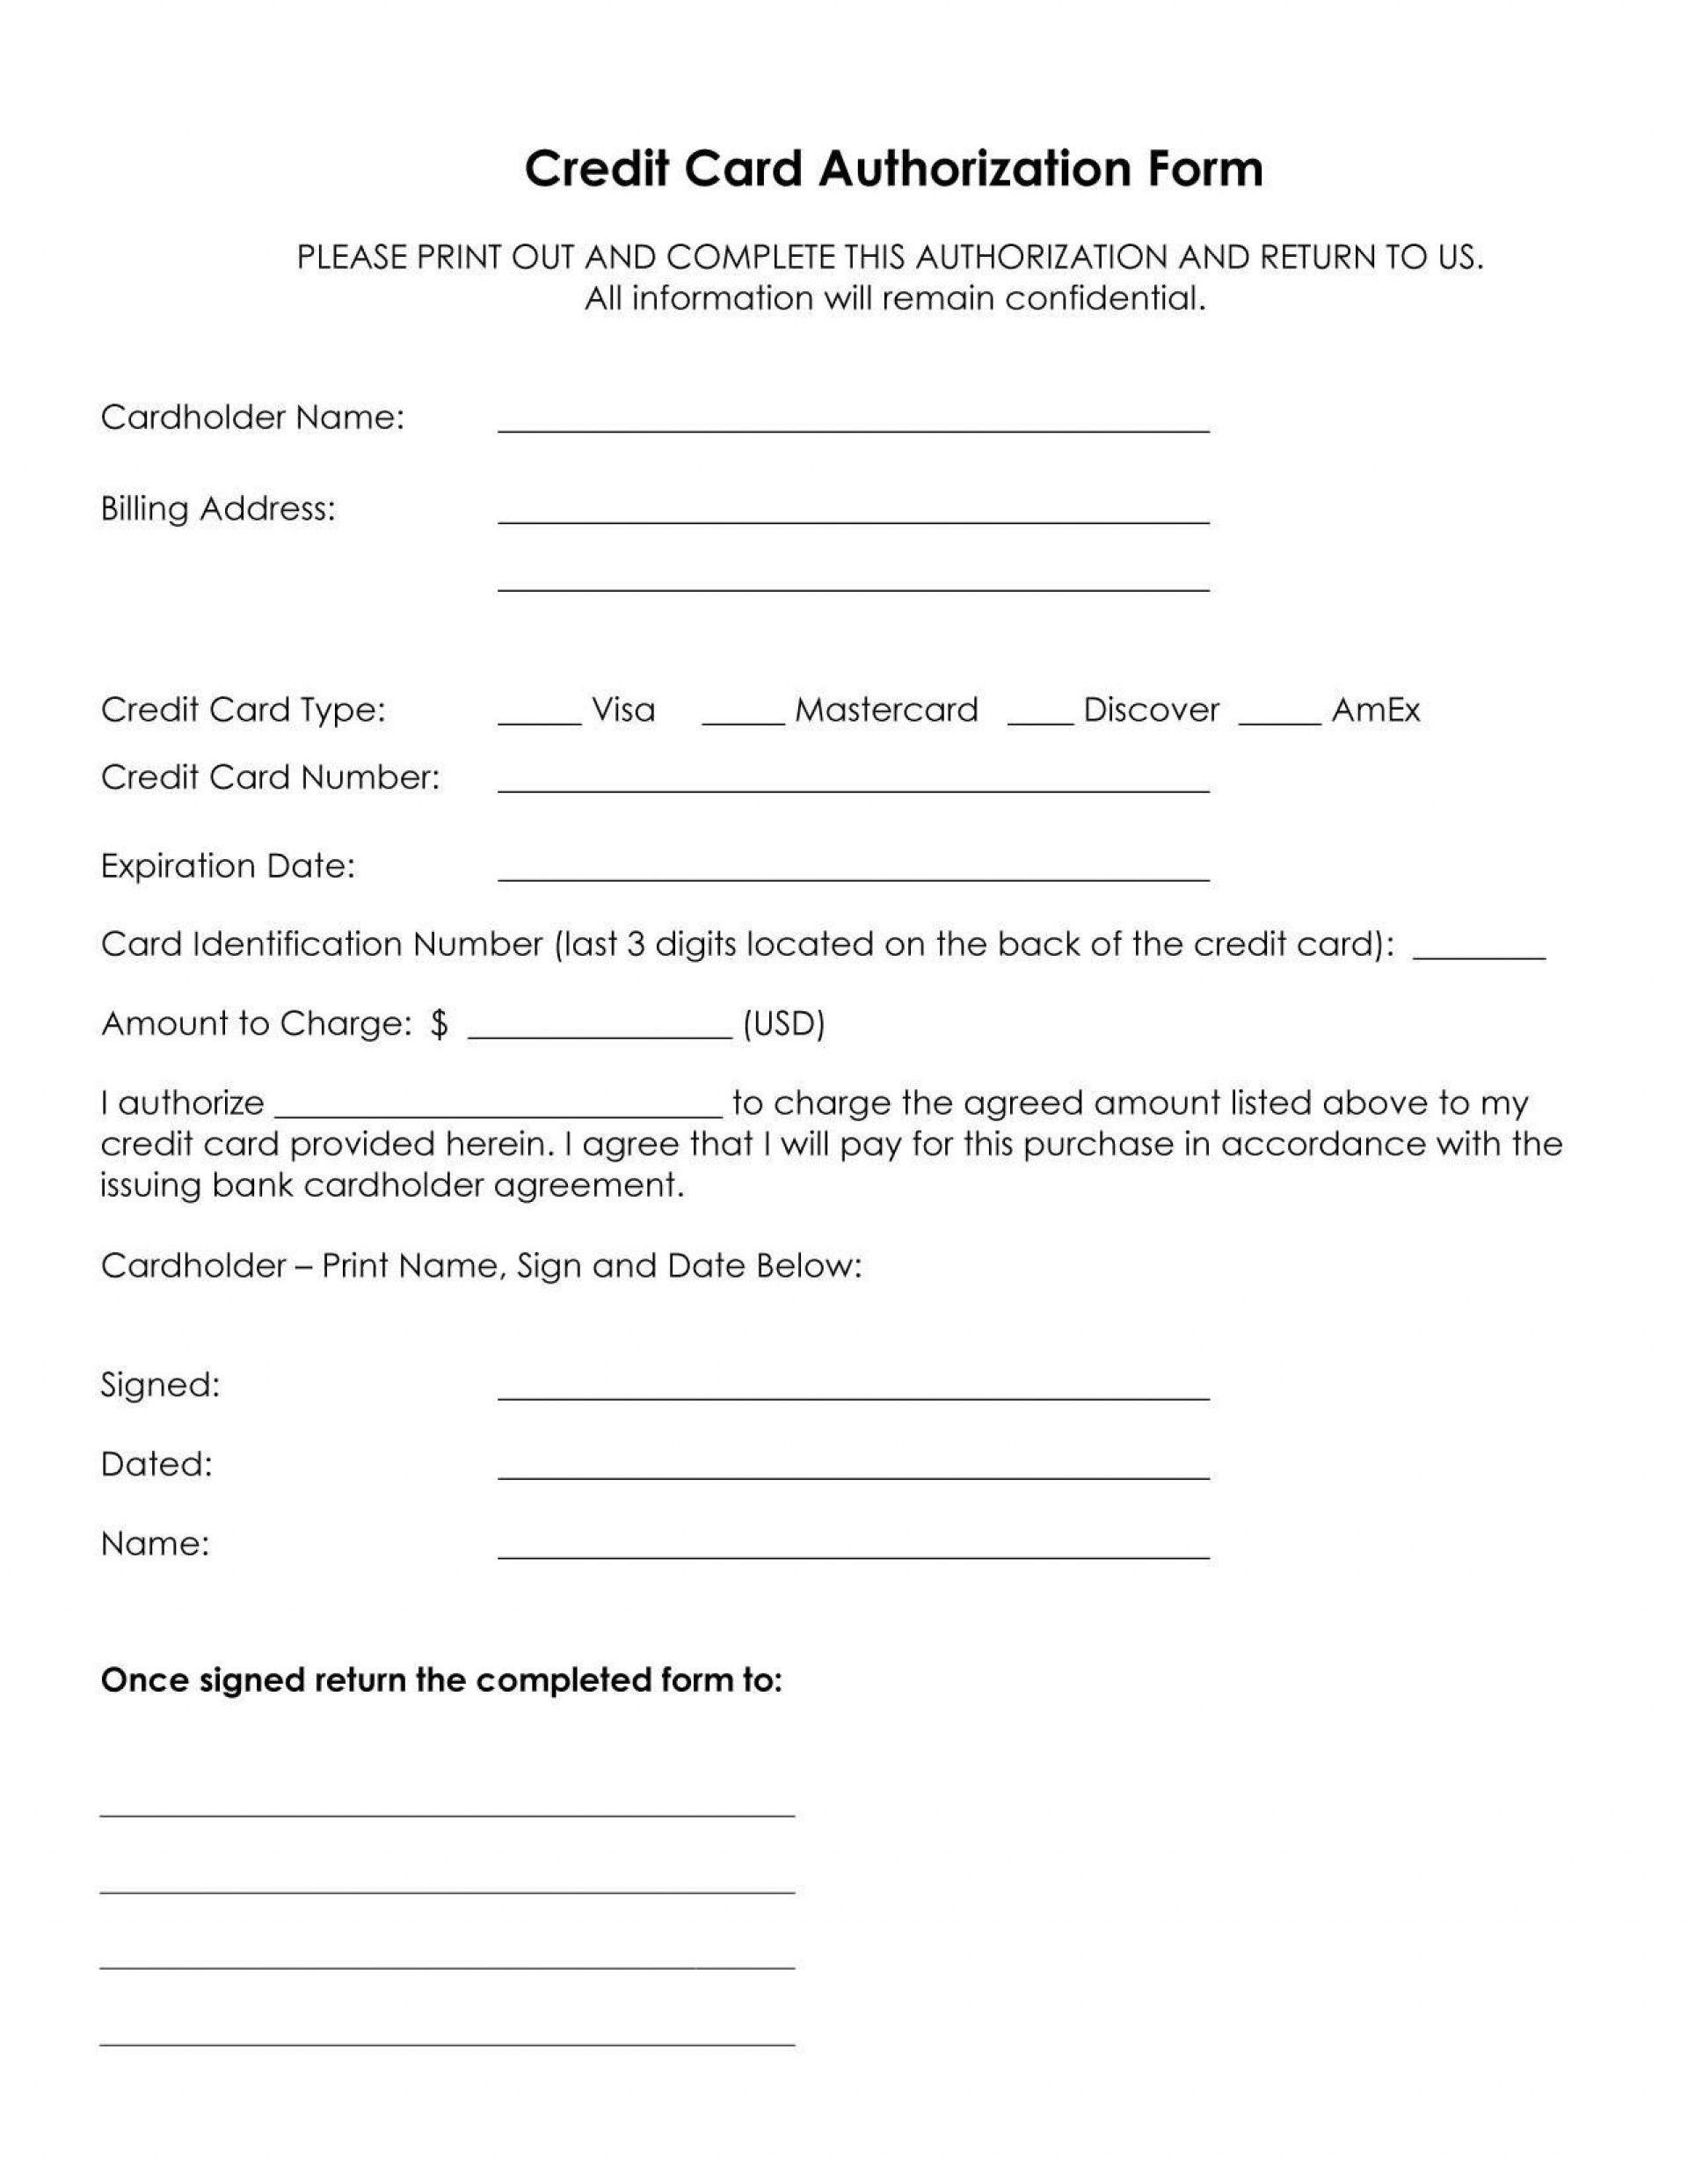 006 Unbelievable Credit Card Form Template Excel Inspiration  Authorization Payment1920